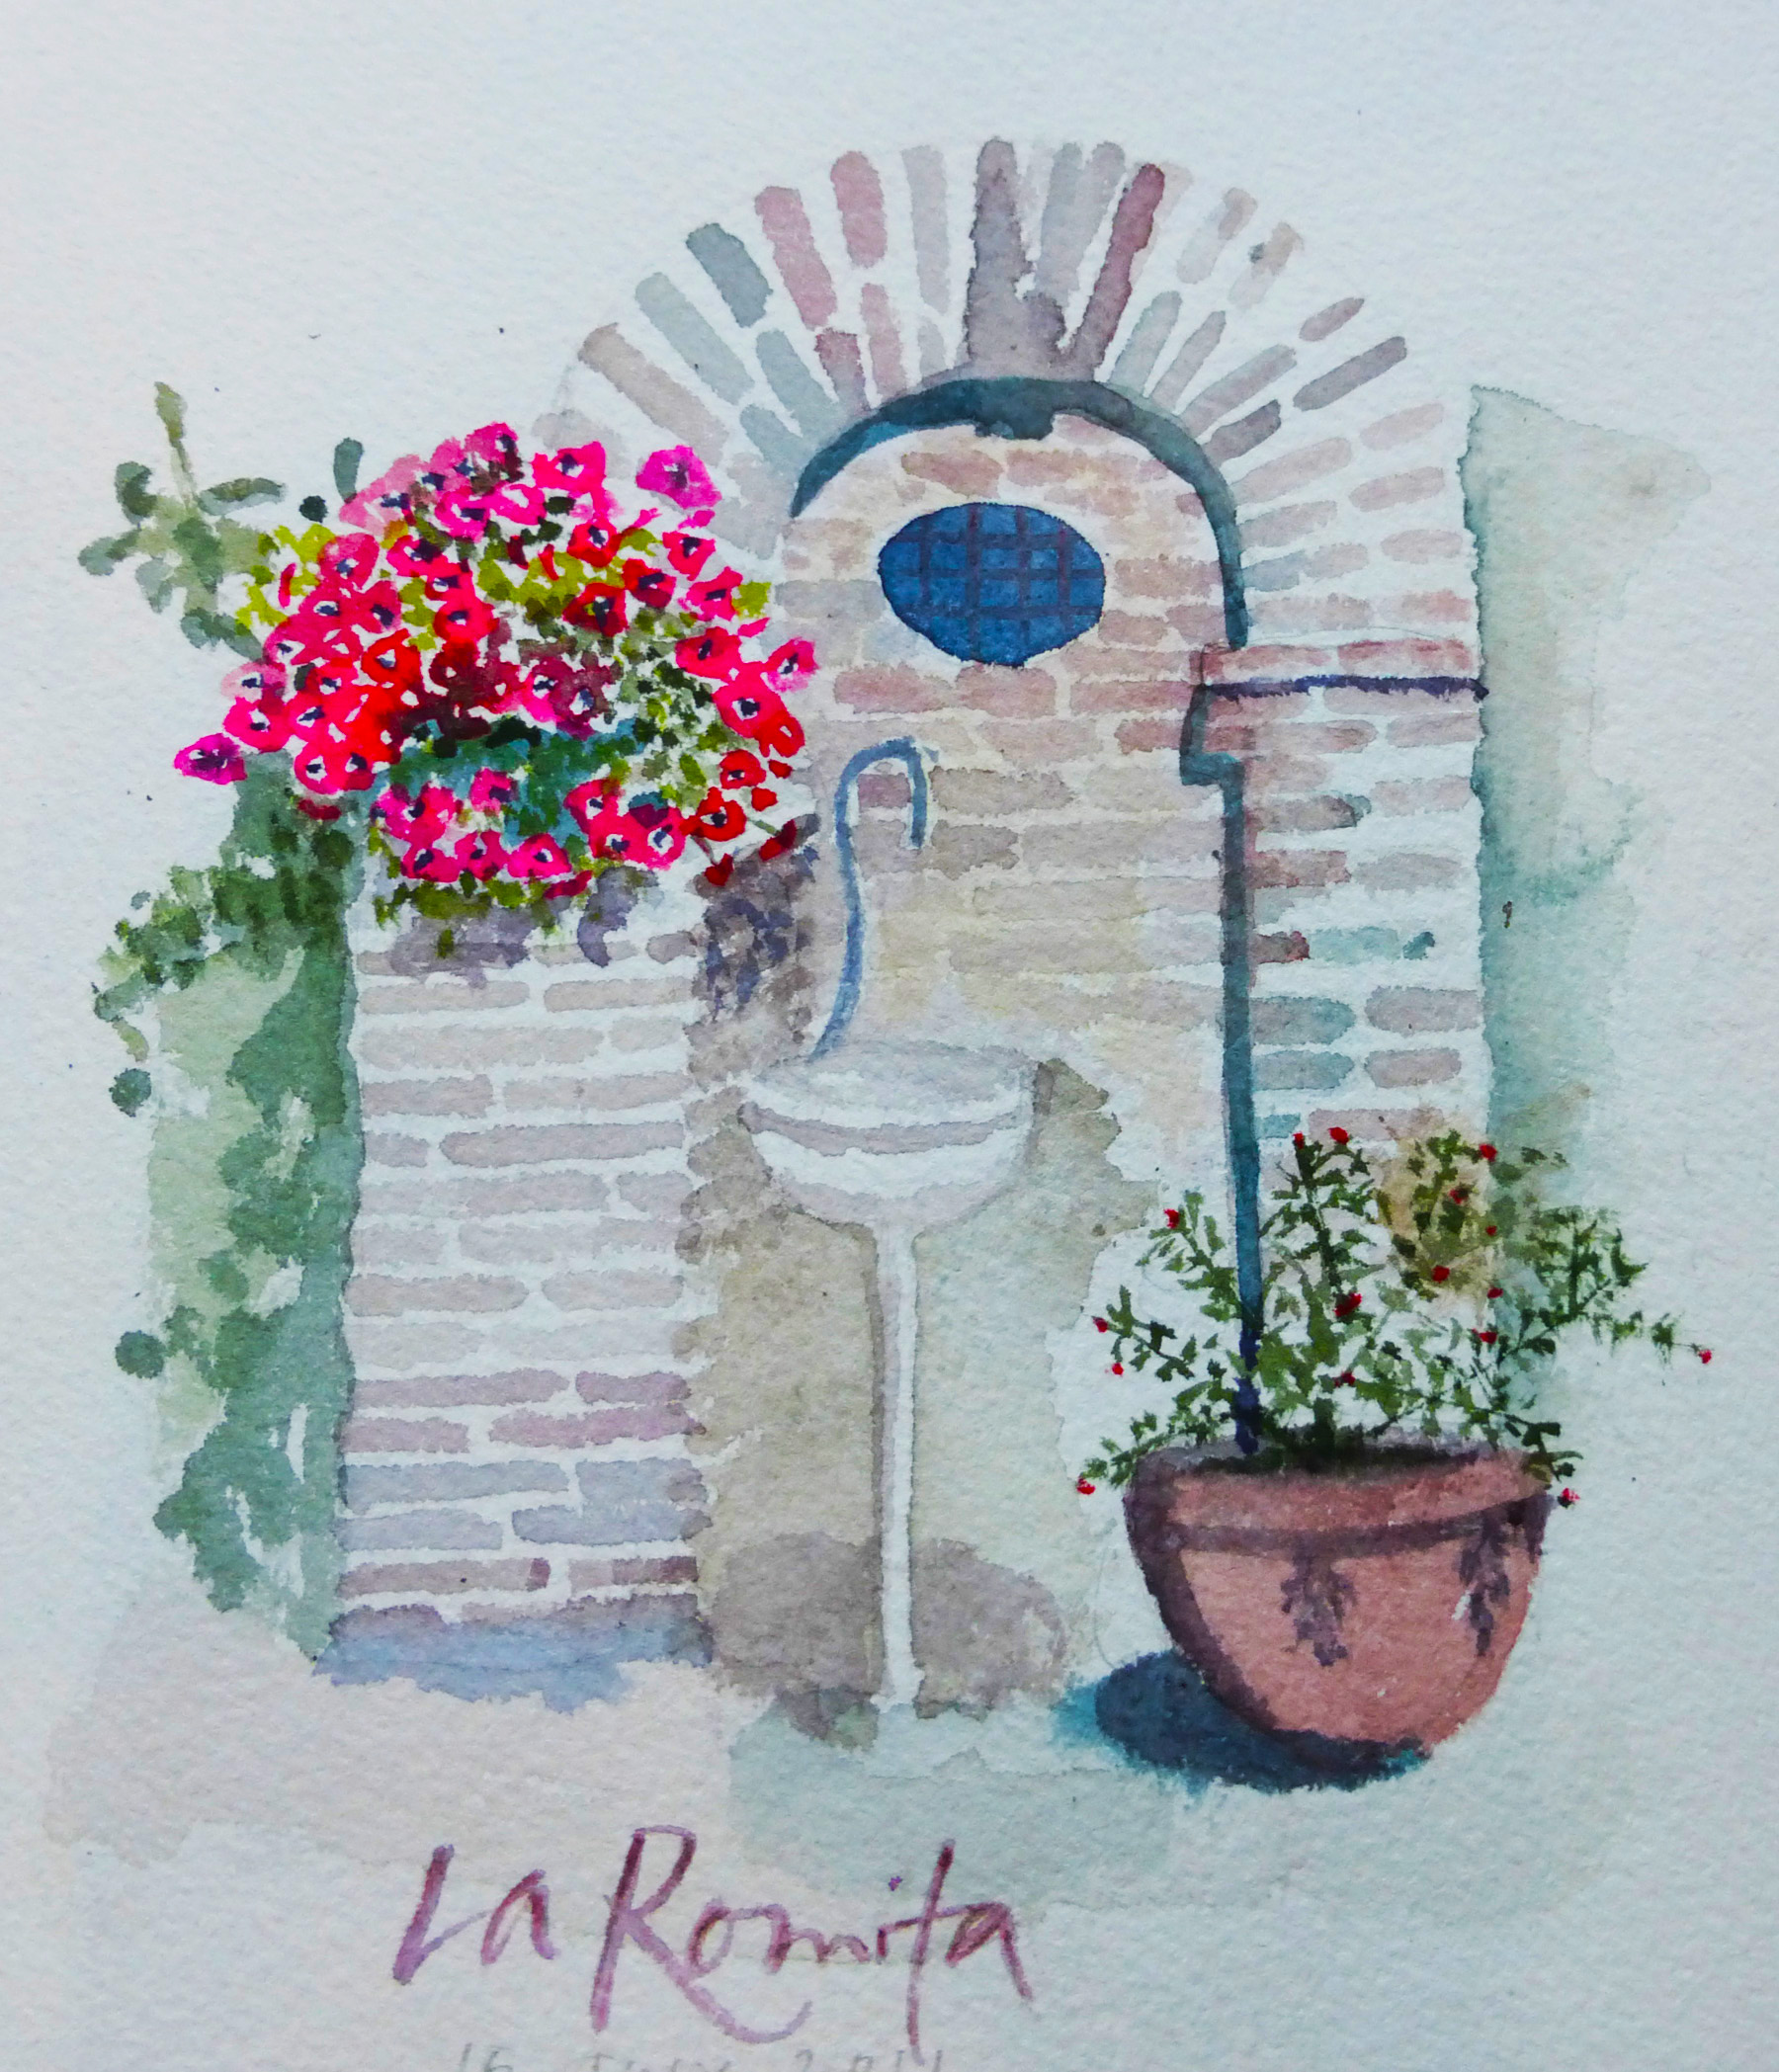 The courtyard at La Romita School of Art, Italy